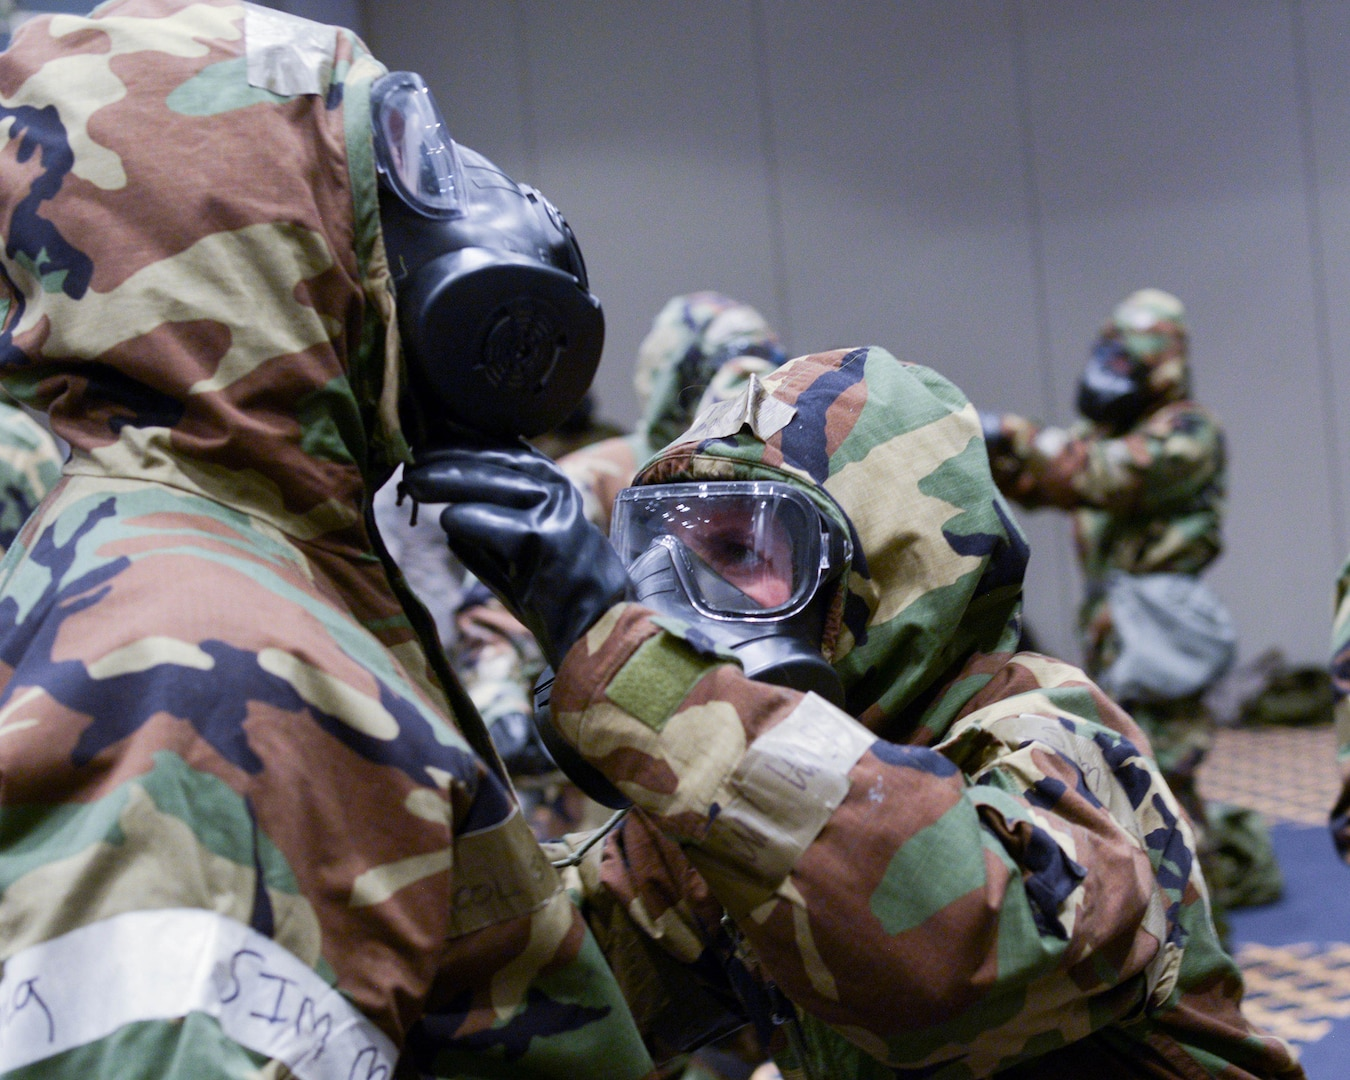 374th MDG Hosts Joint Bilateral CBRN Training